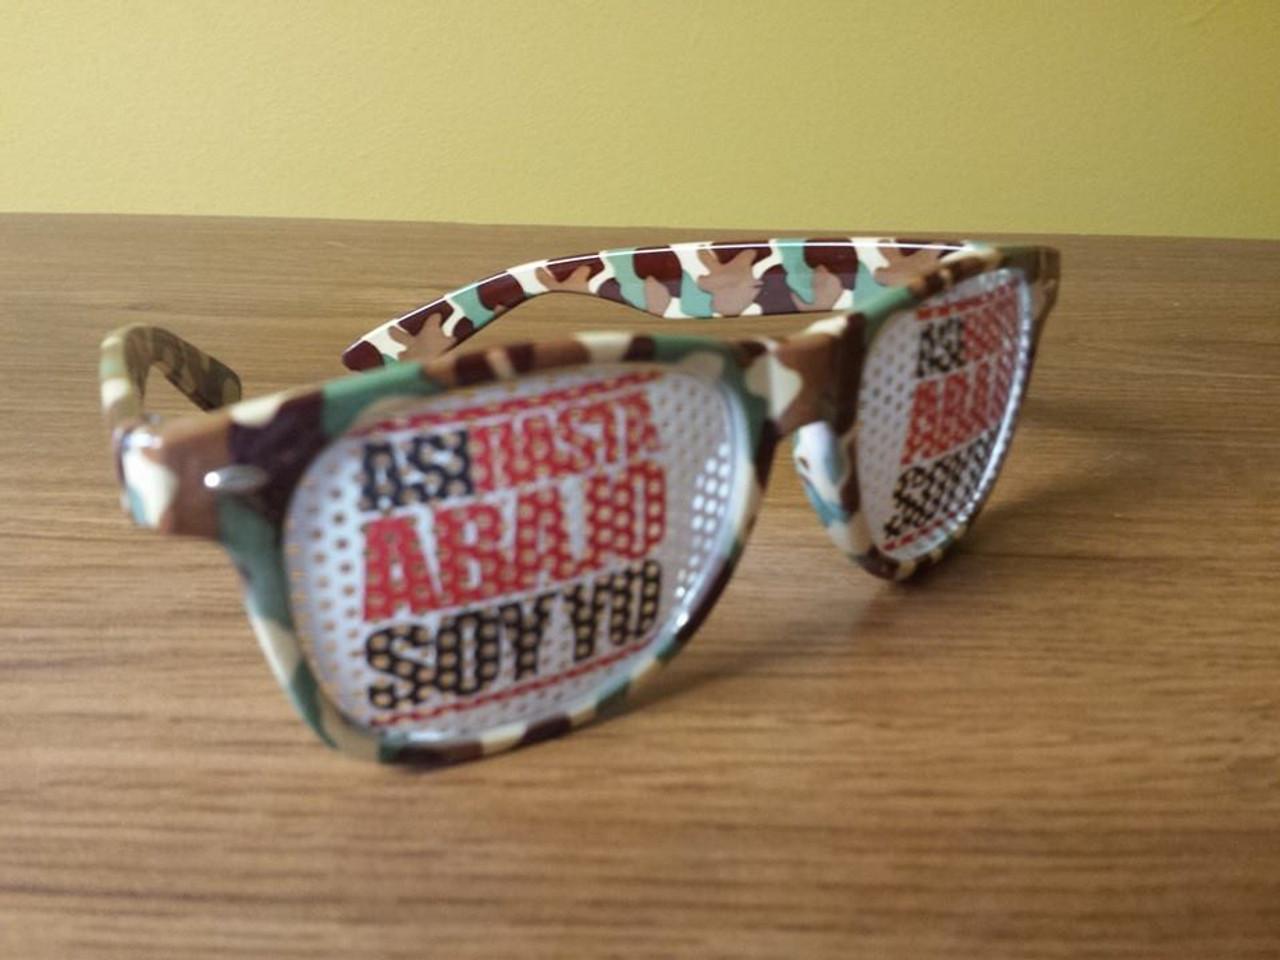 custom, printed, party, promo, camo, frames, sun glasses